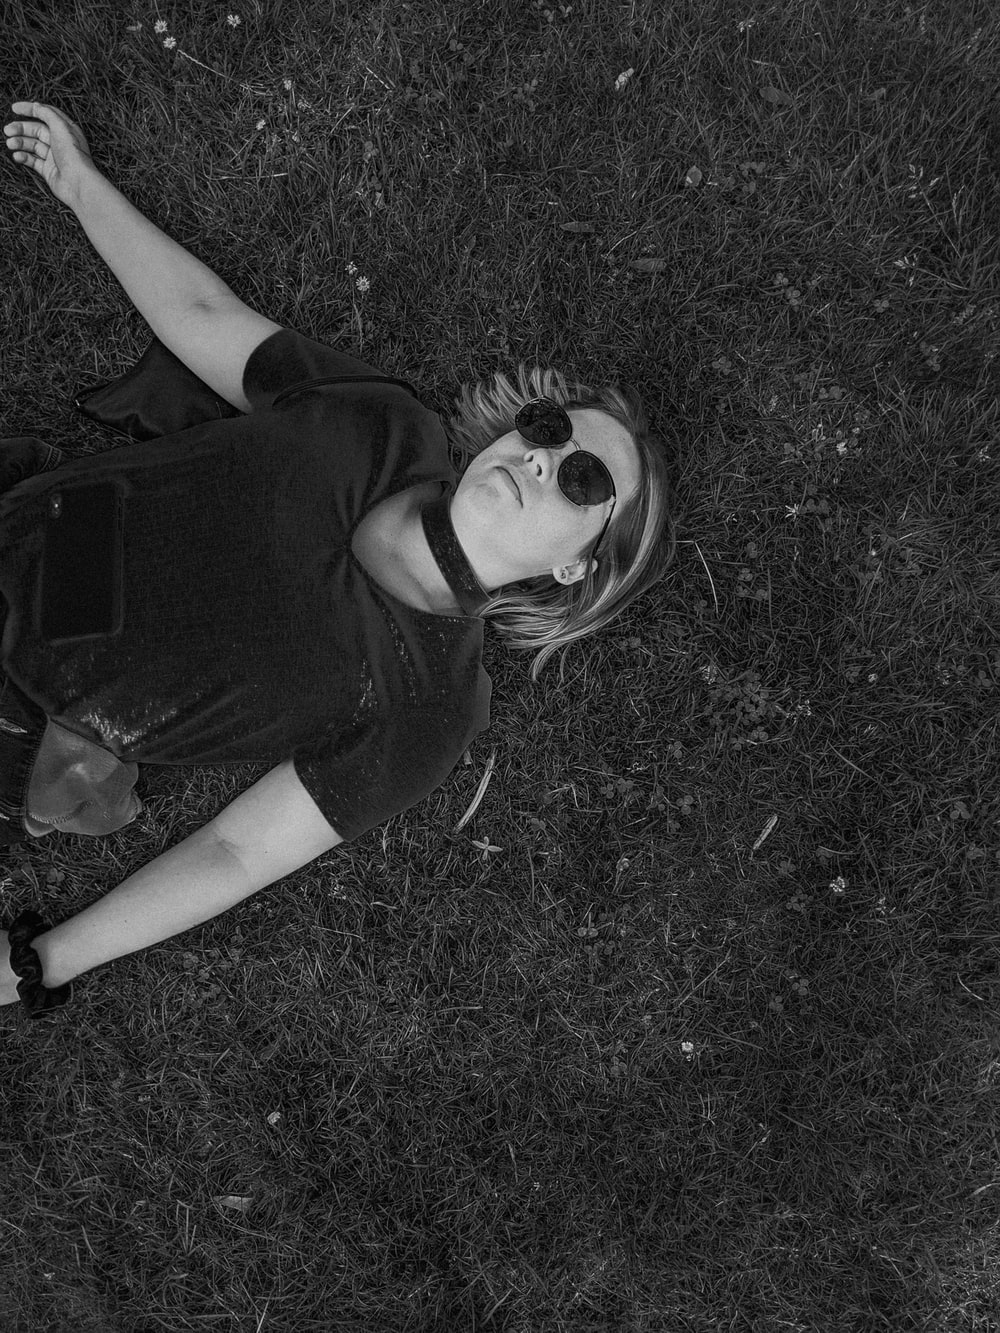 woman in black t-shirt lying on grass field